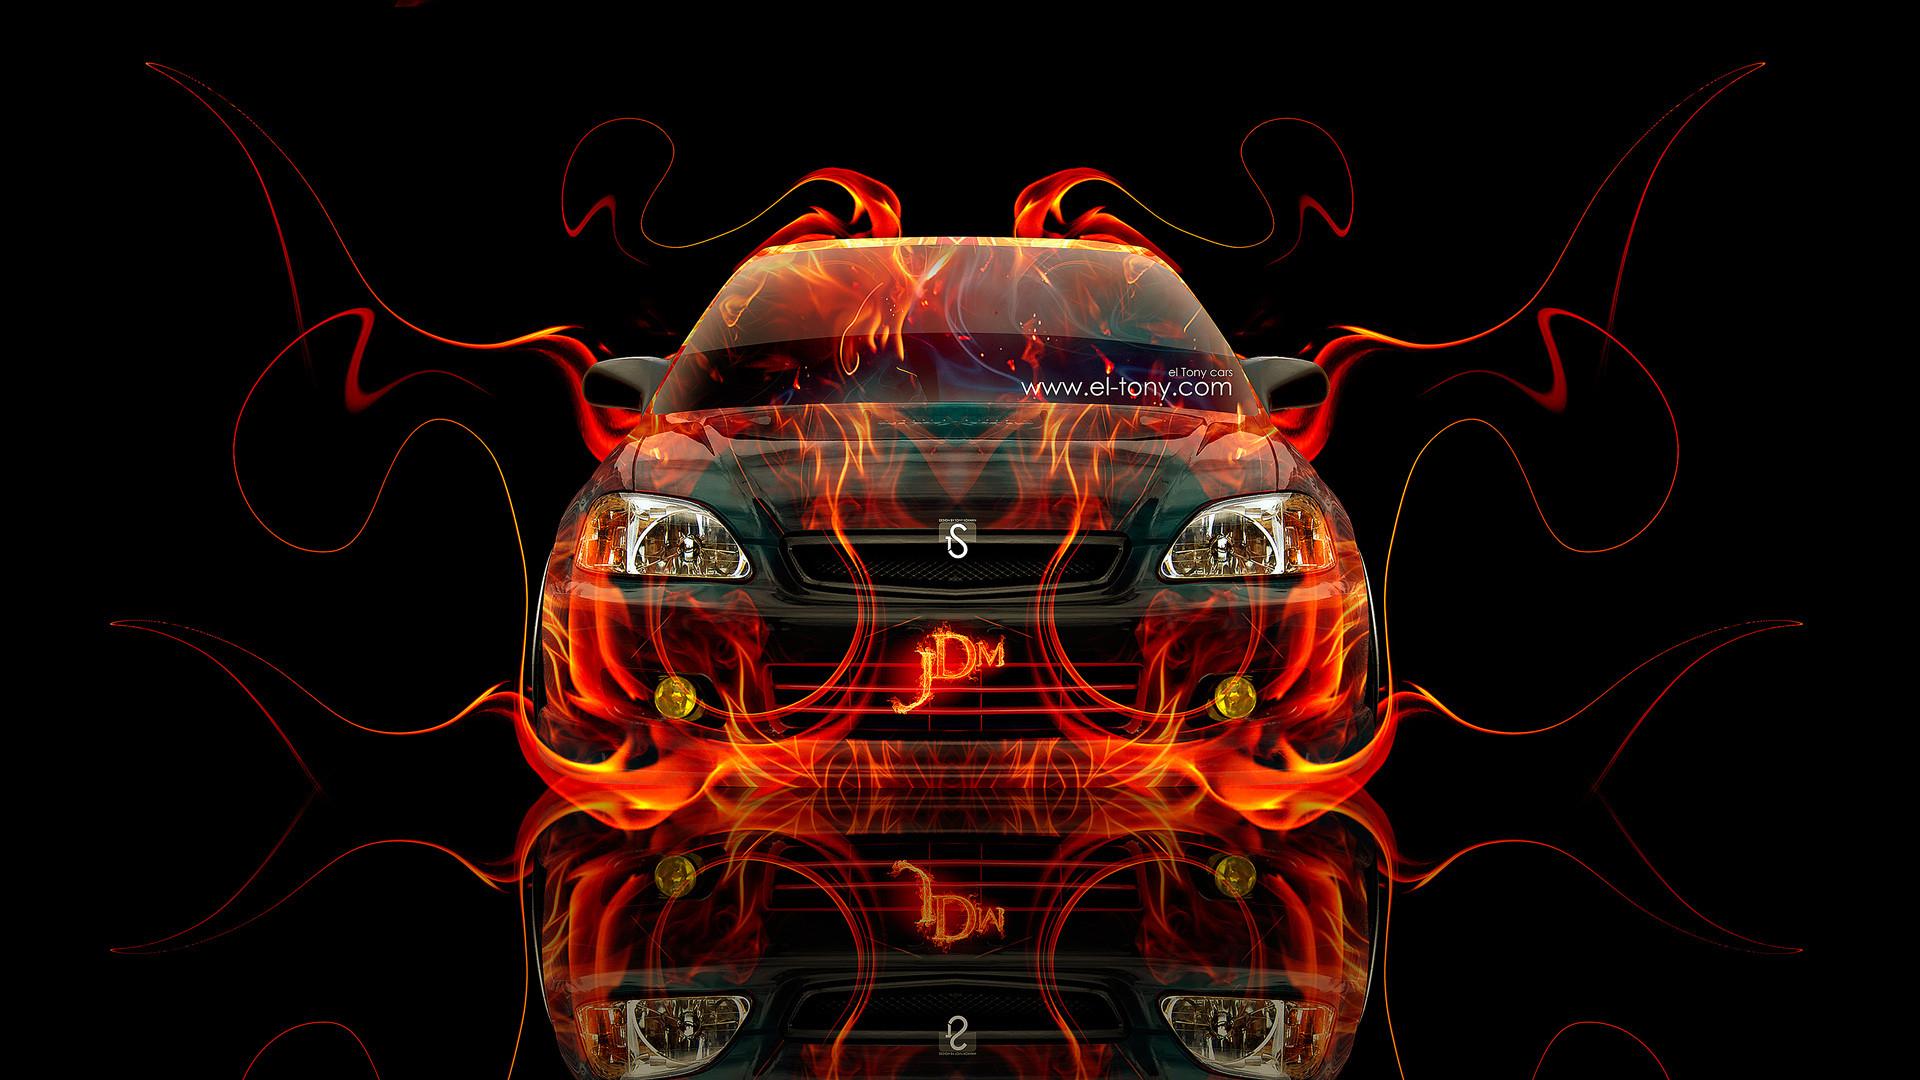 … Jdm Honda Logo #419